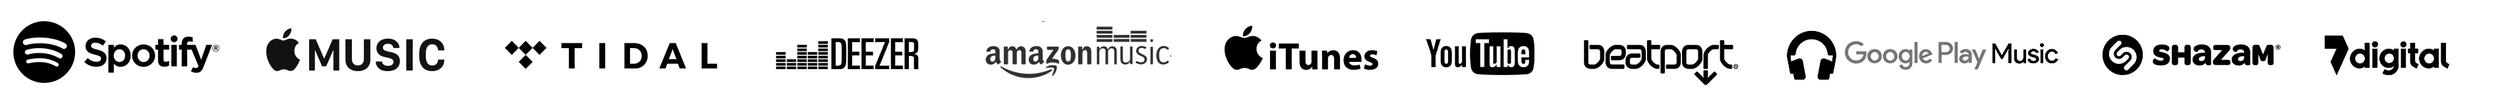 logos-long.png